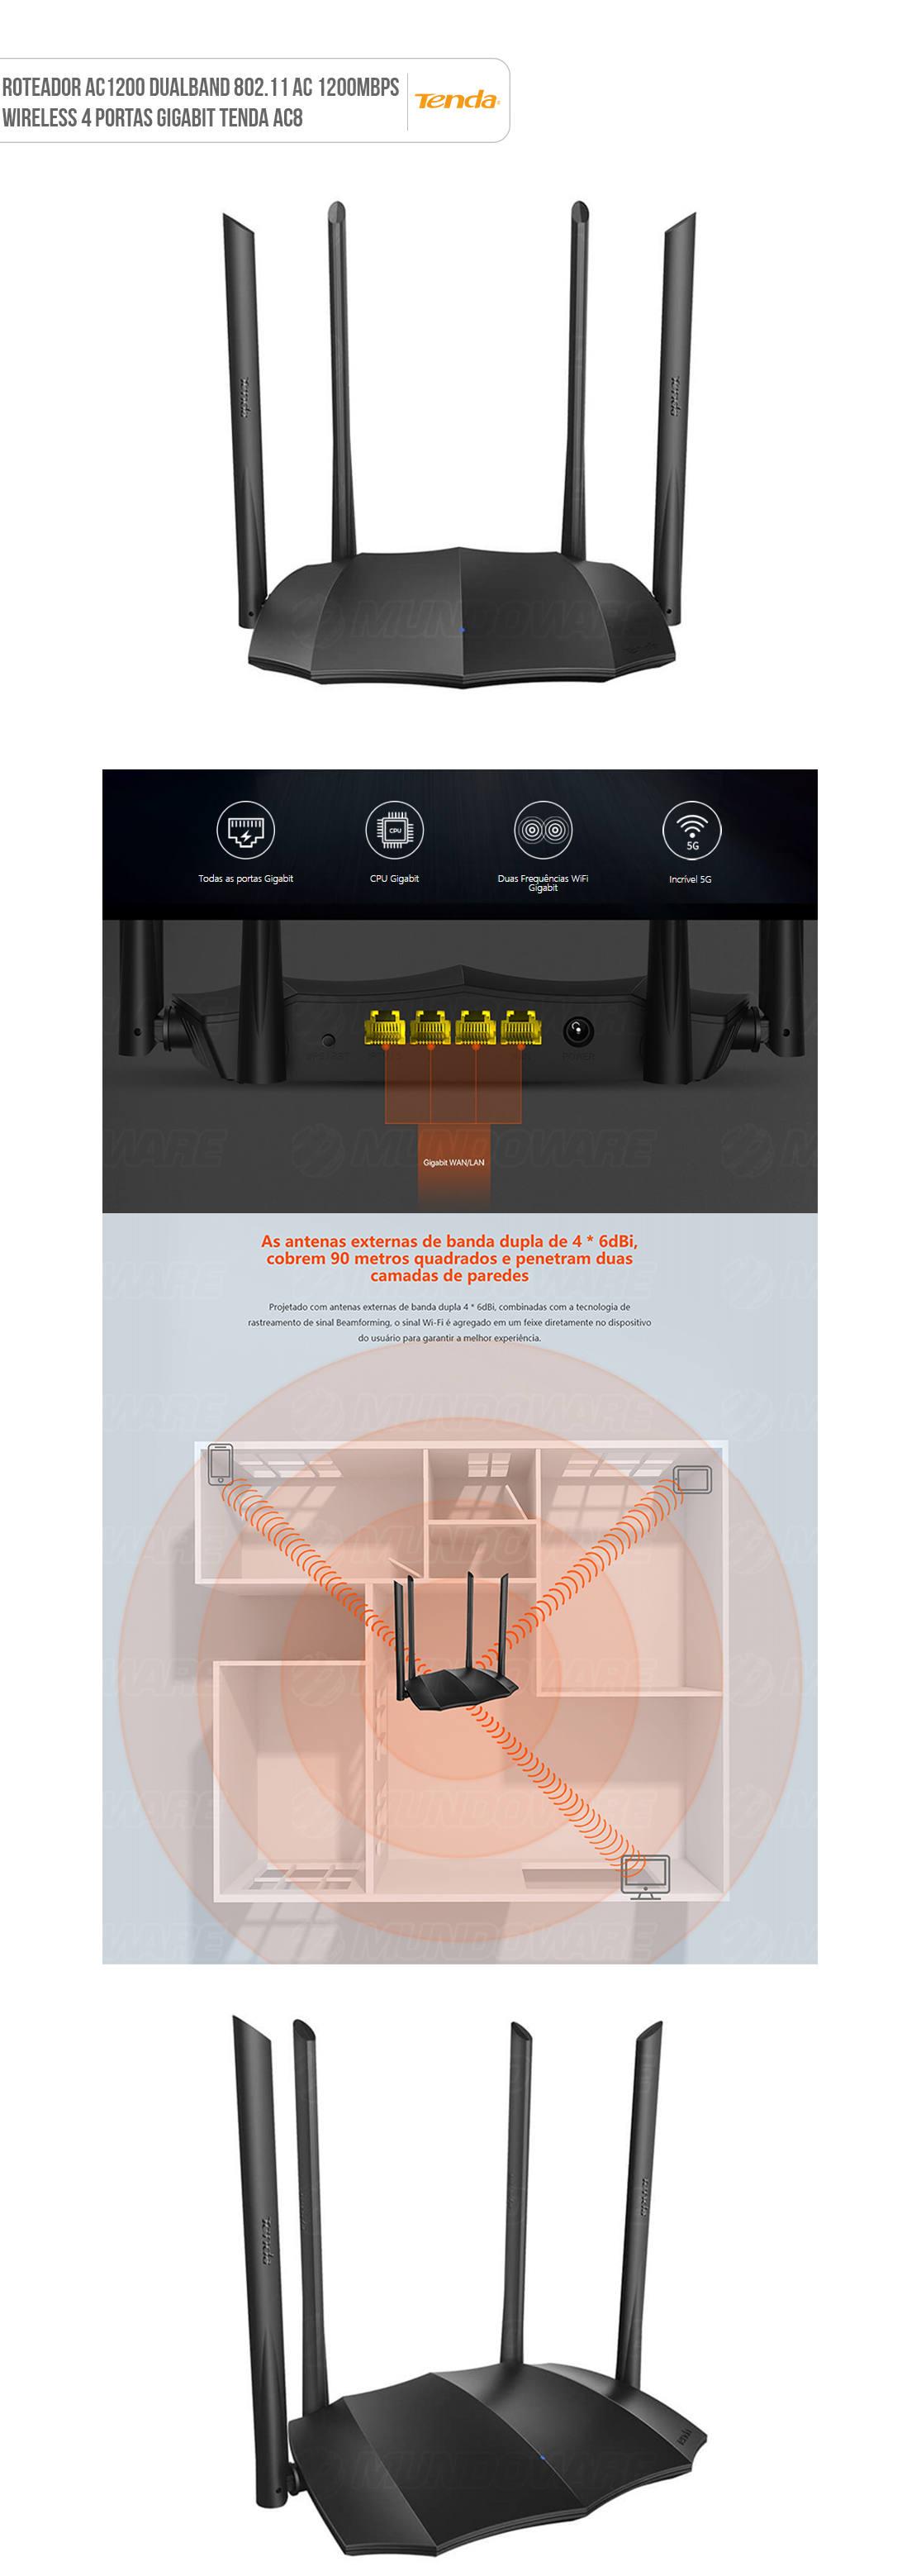 Roteador Sem Fio 1200Mbps Dual-band Gigabit Wireless AC1200 802.11AC 4 Portas Gigabit Tenda WIFI AC8